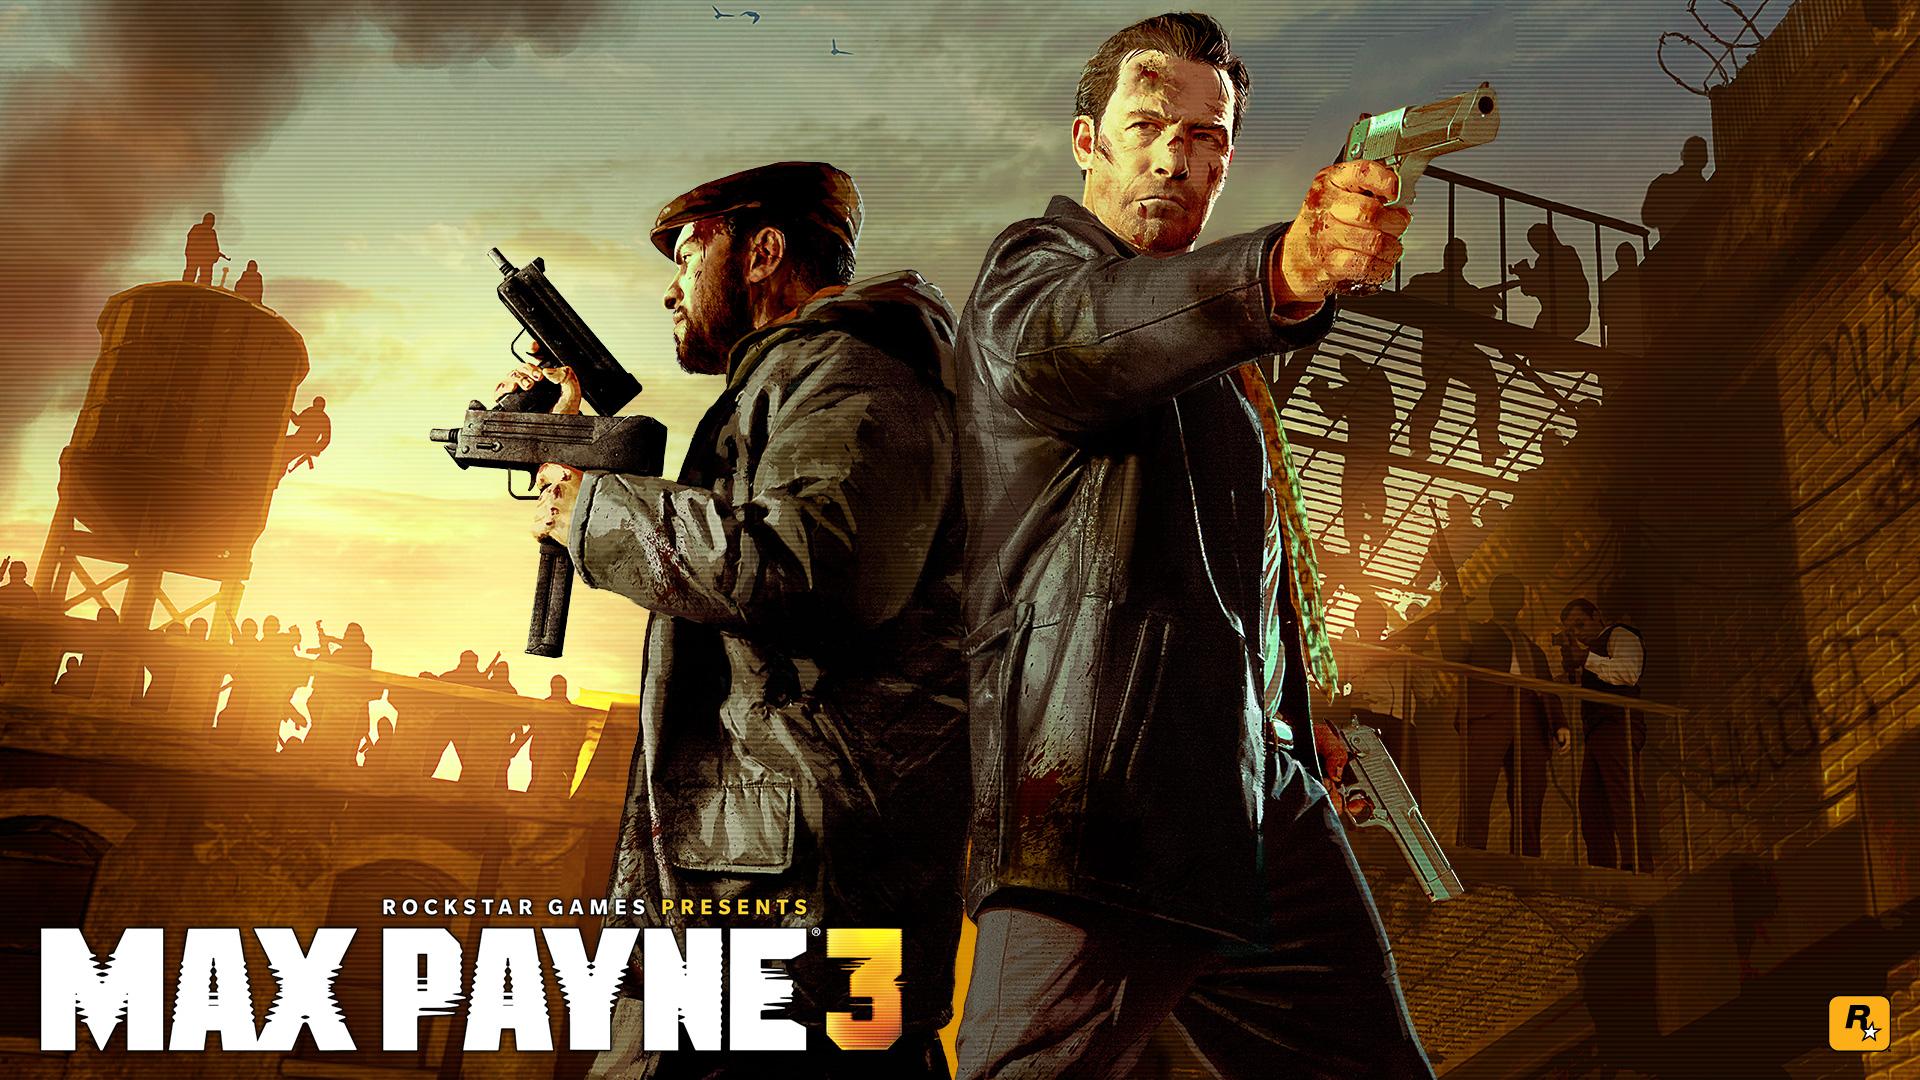 Max Payne 3 Free Download - CroHasIt - Download PC Games